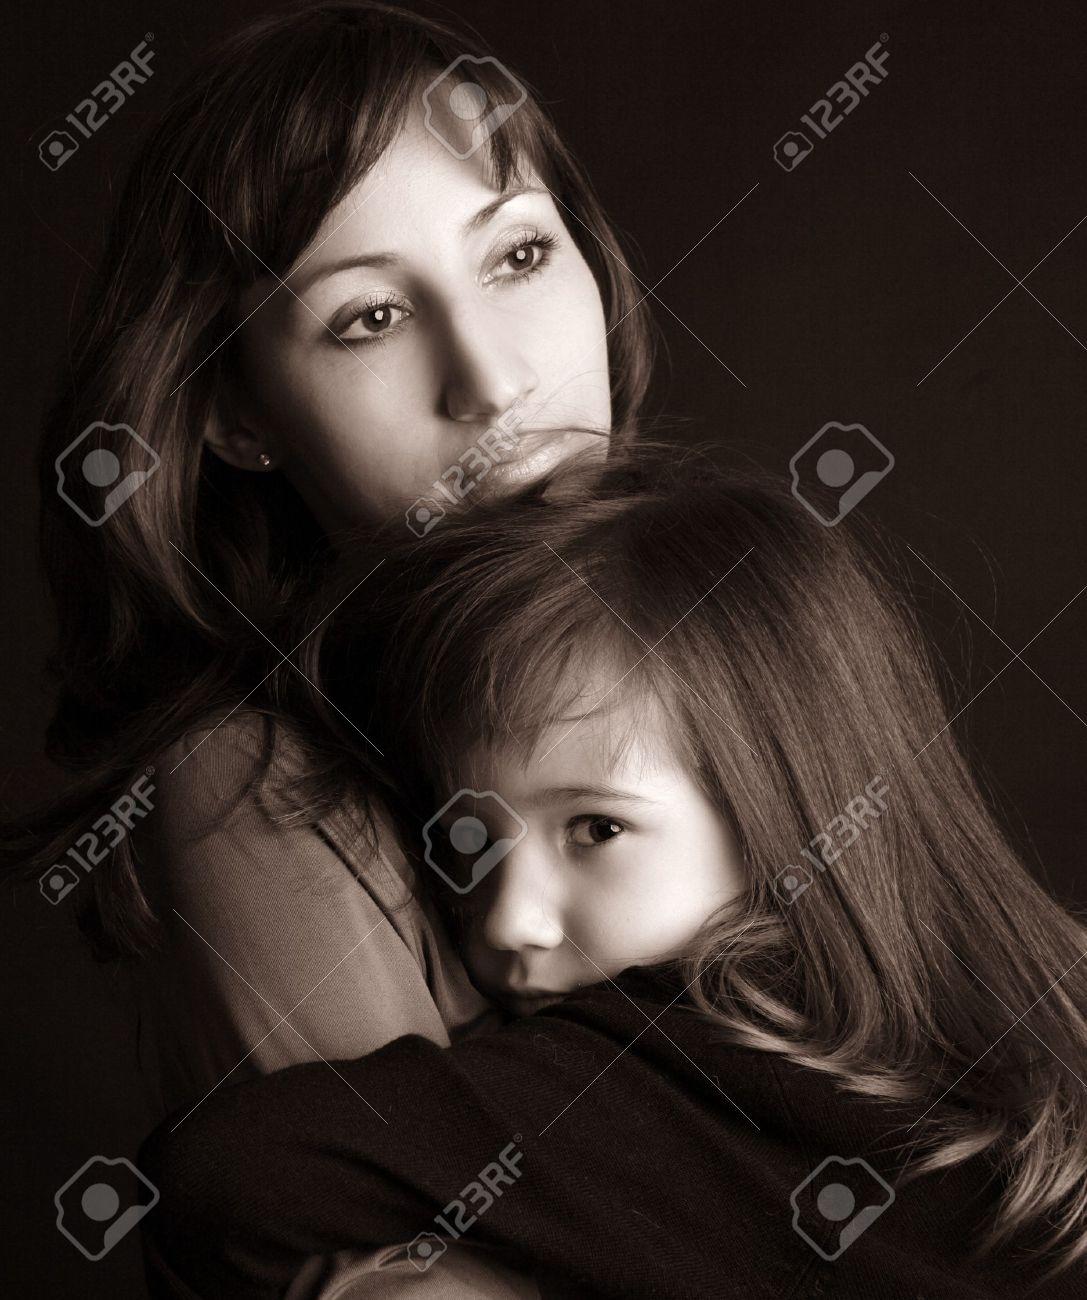 Увидел маму фото 26 фотография